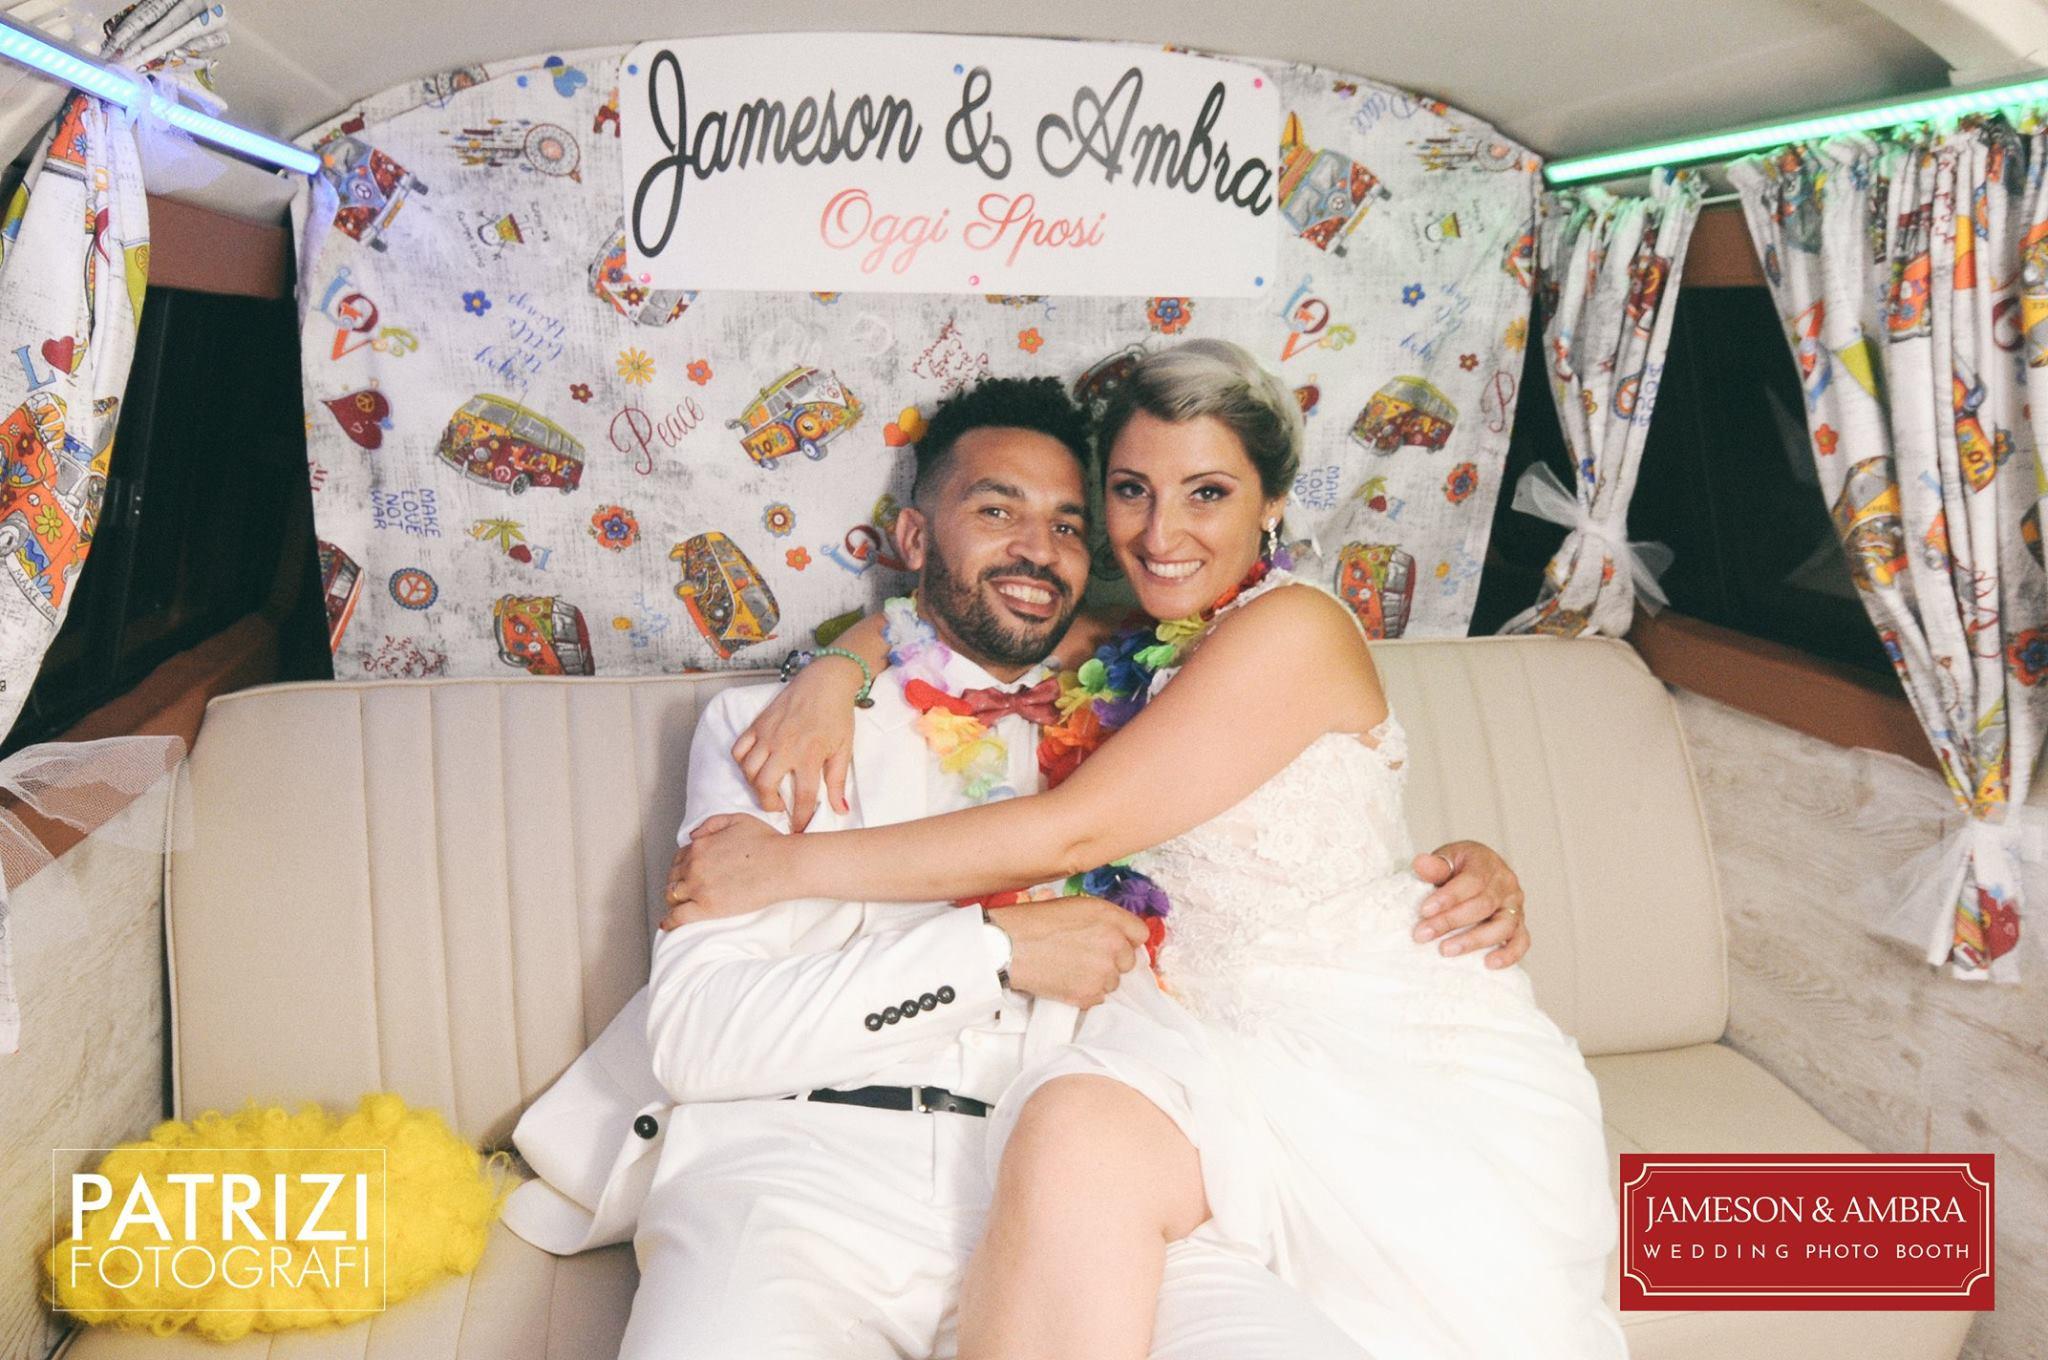 patrizi-fotografi-matrimoni-pulmino-photobooth-jameson-e-ambra-17